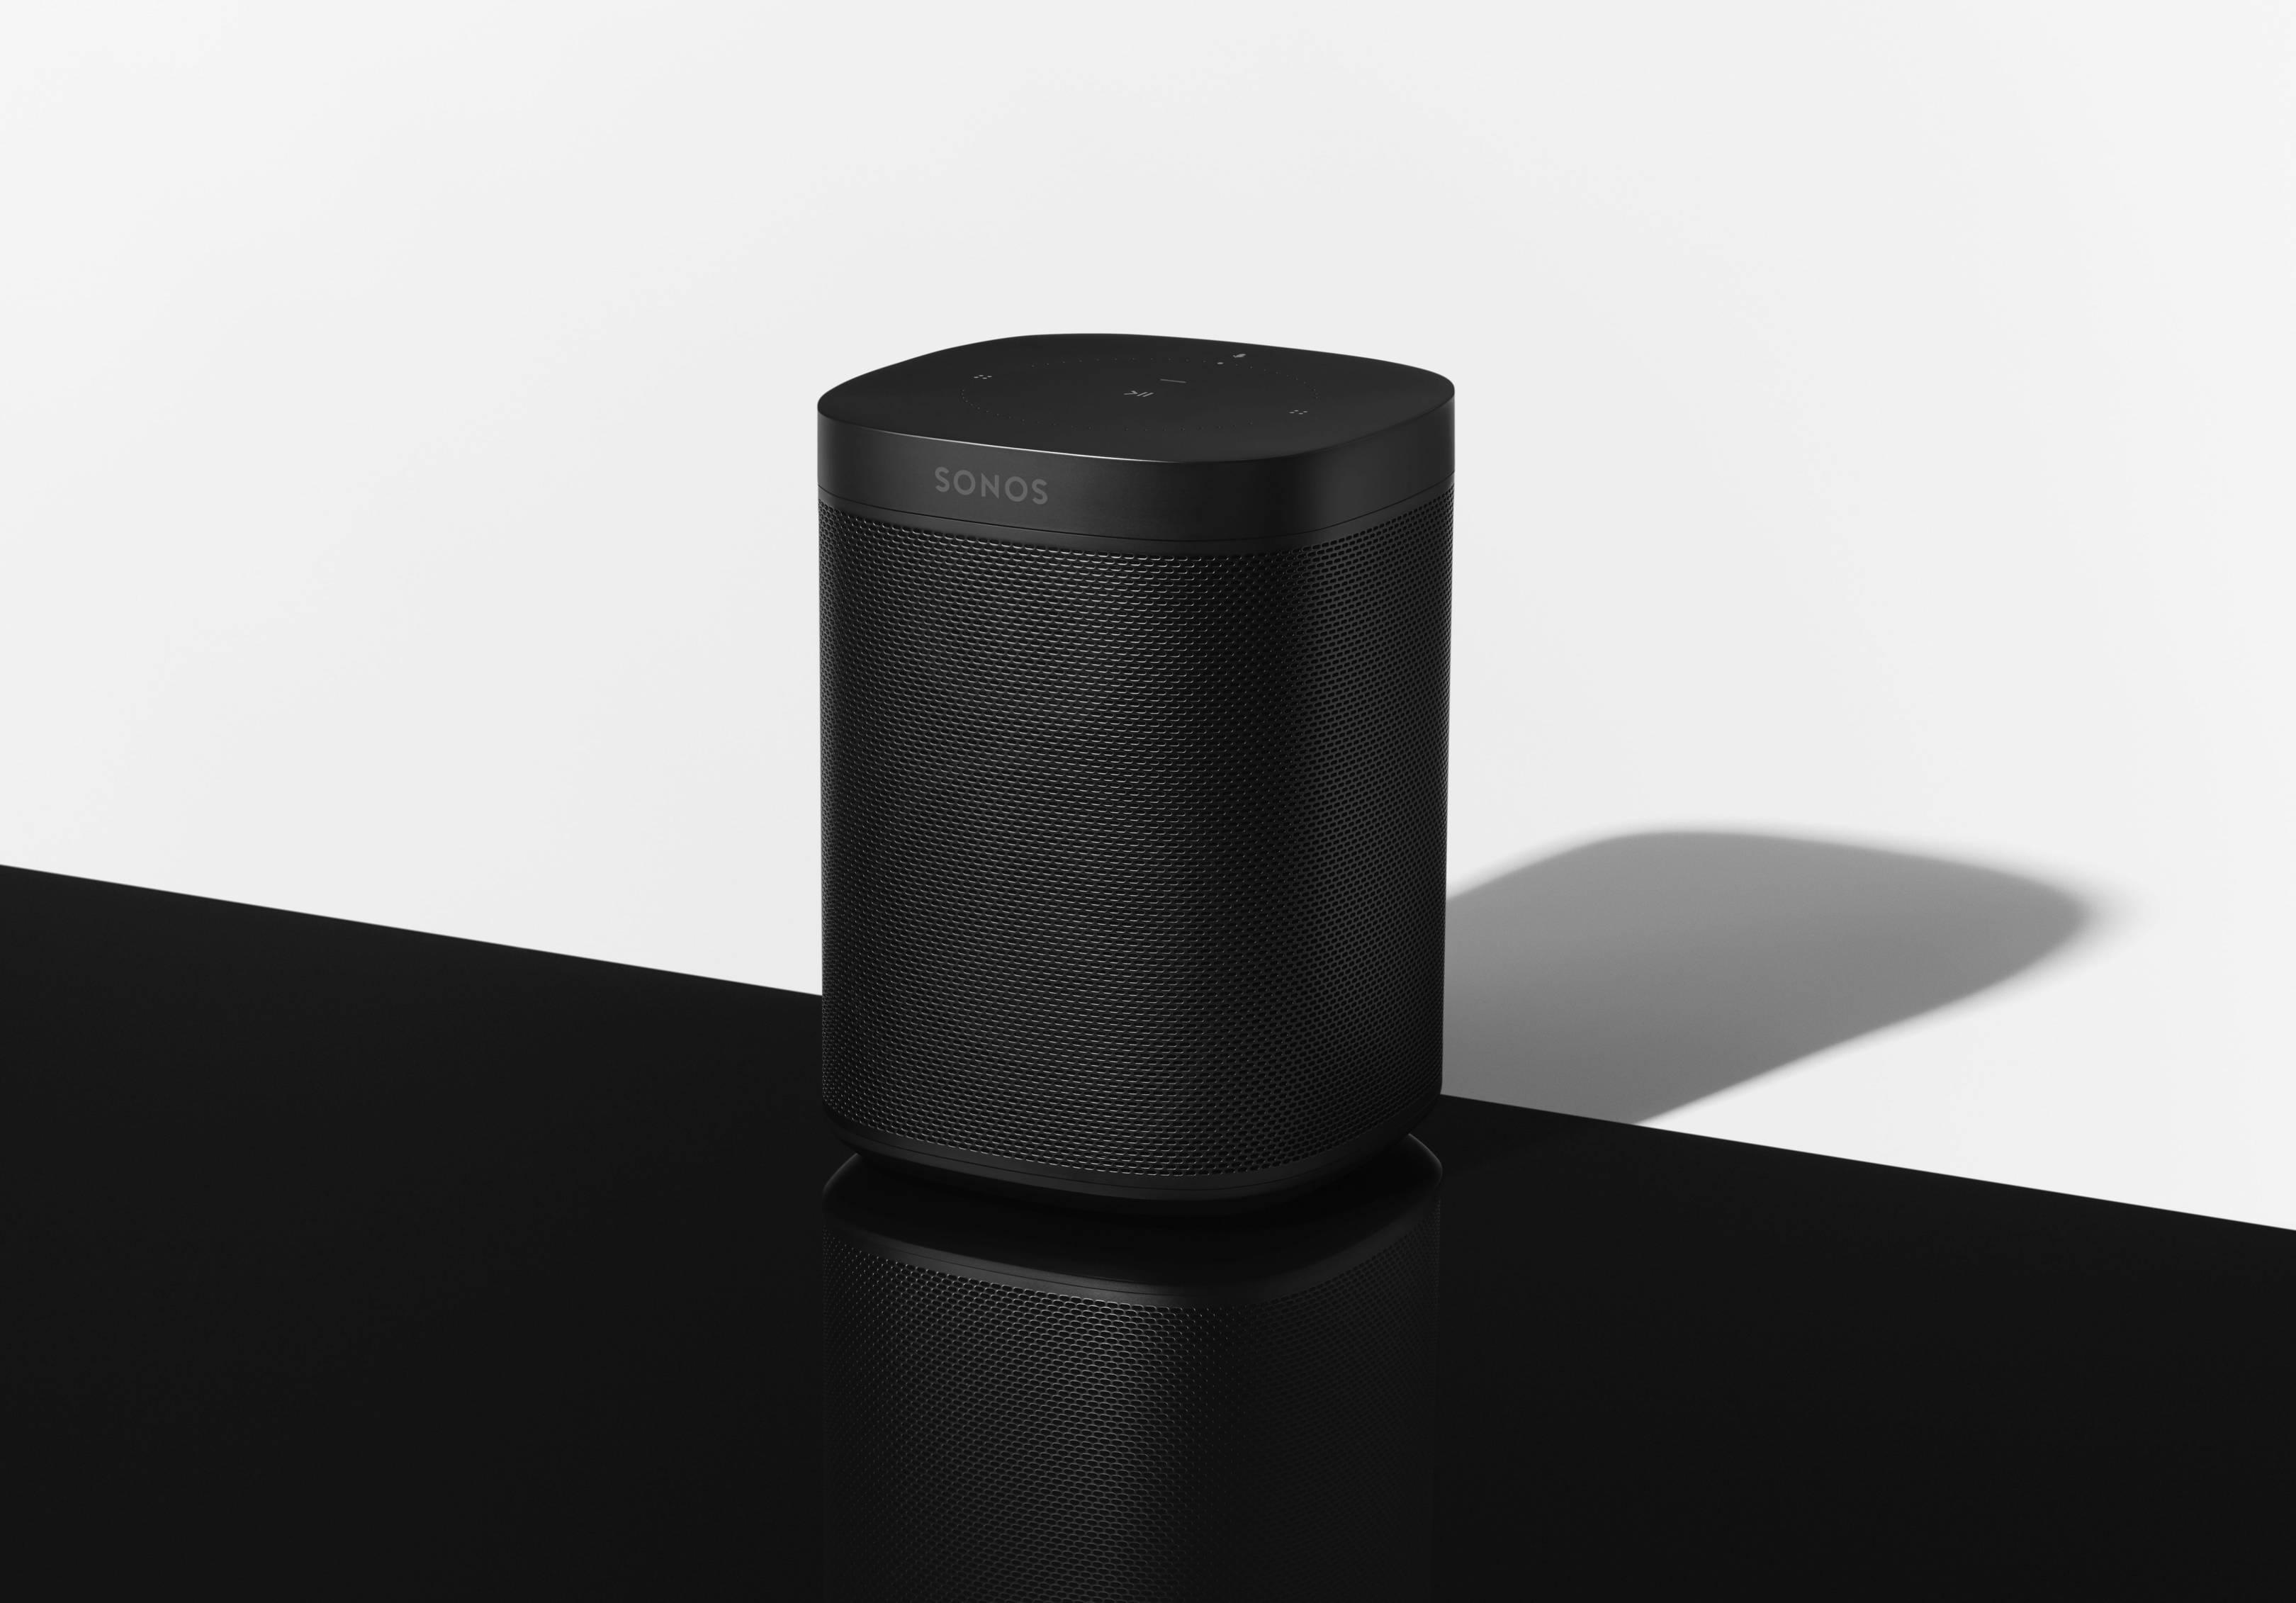 play alexa on sonos speakers